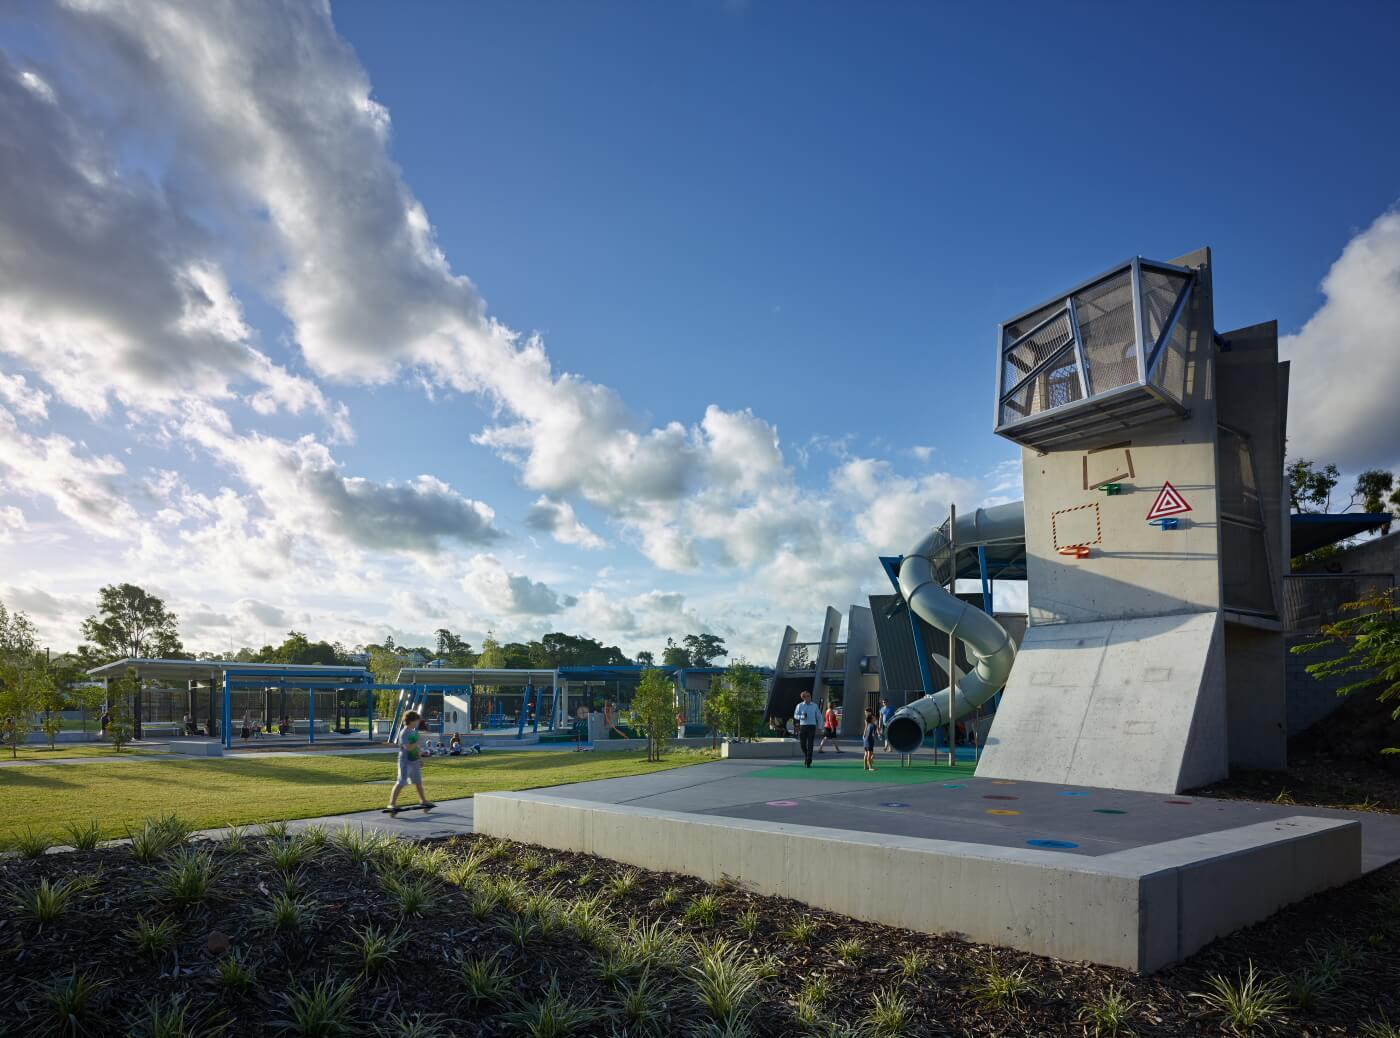 Frew-park-arena-playground-guymer-bailey-03.JPG